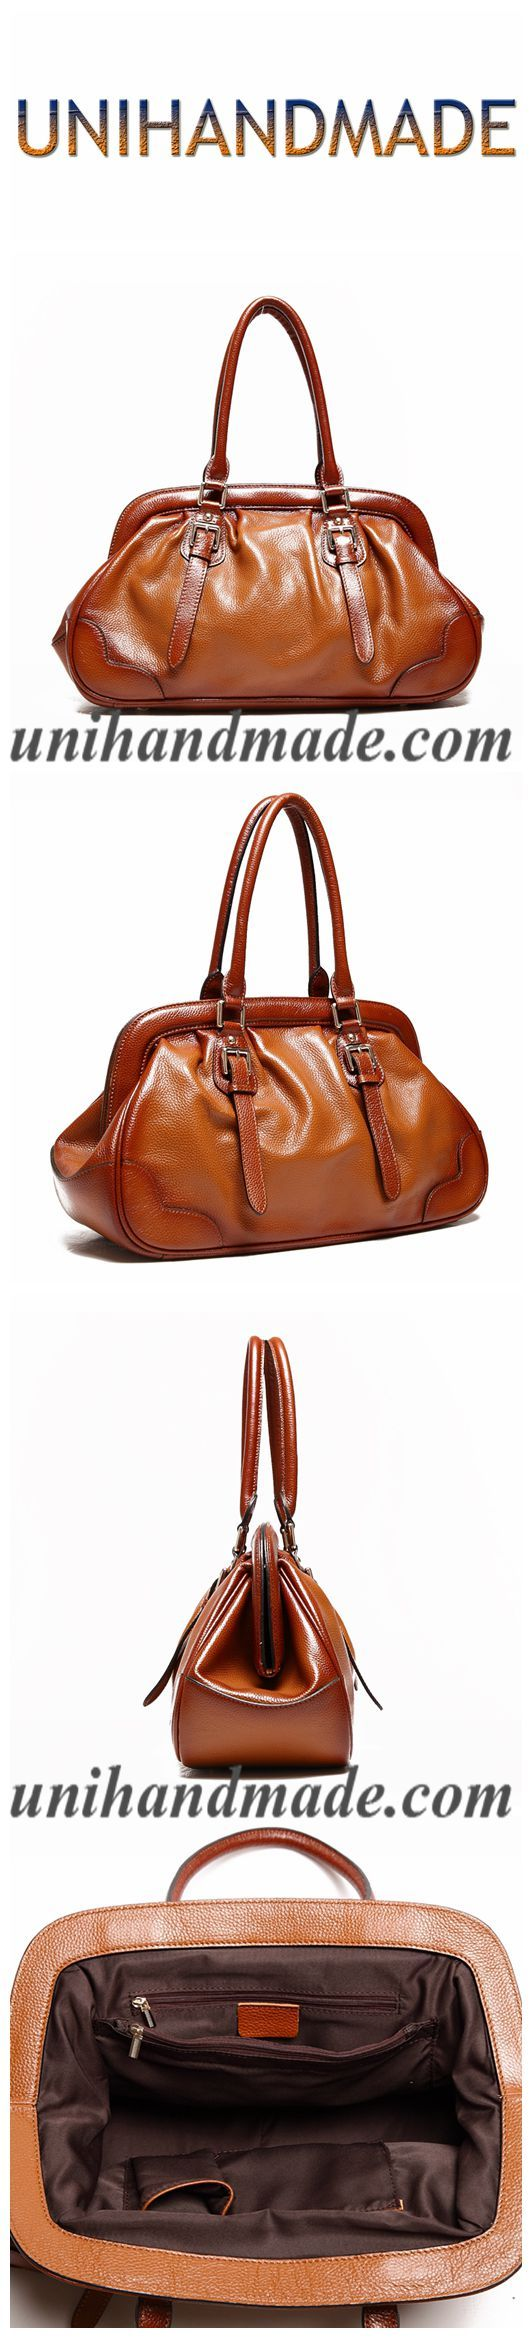 Wholesale Handbag Genuine Leather Fashion Handbag For Girls SL9218